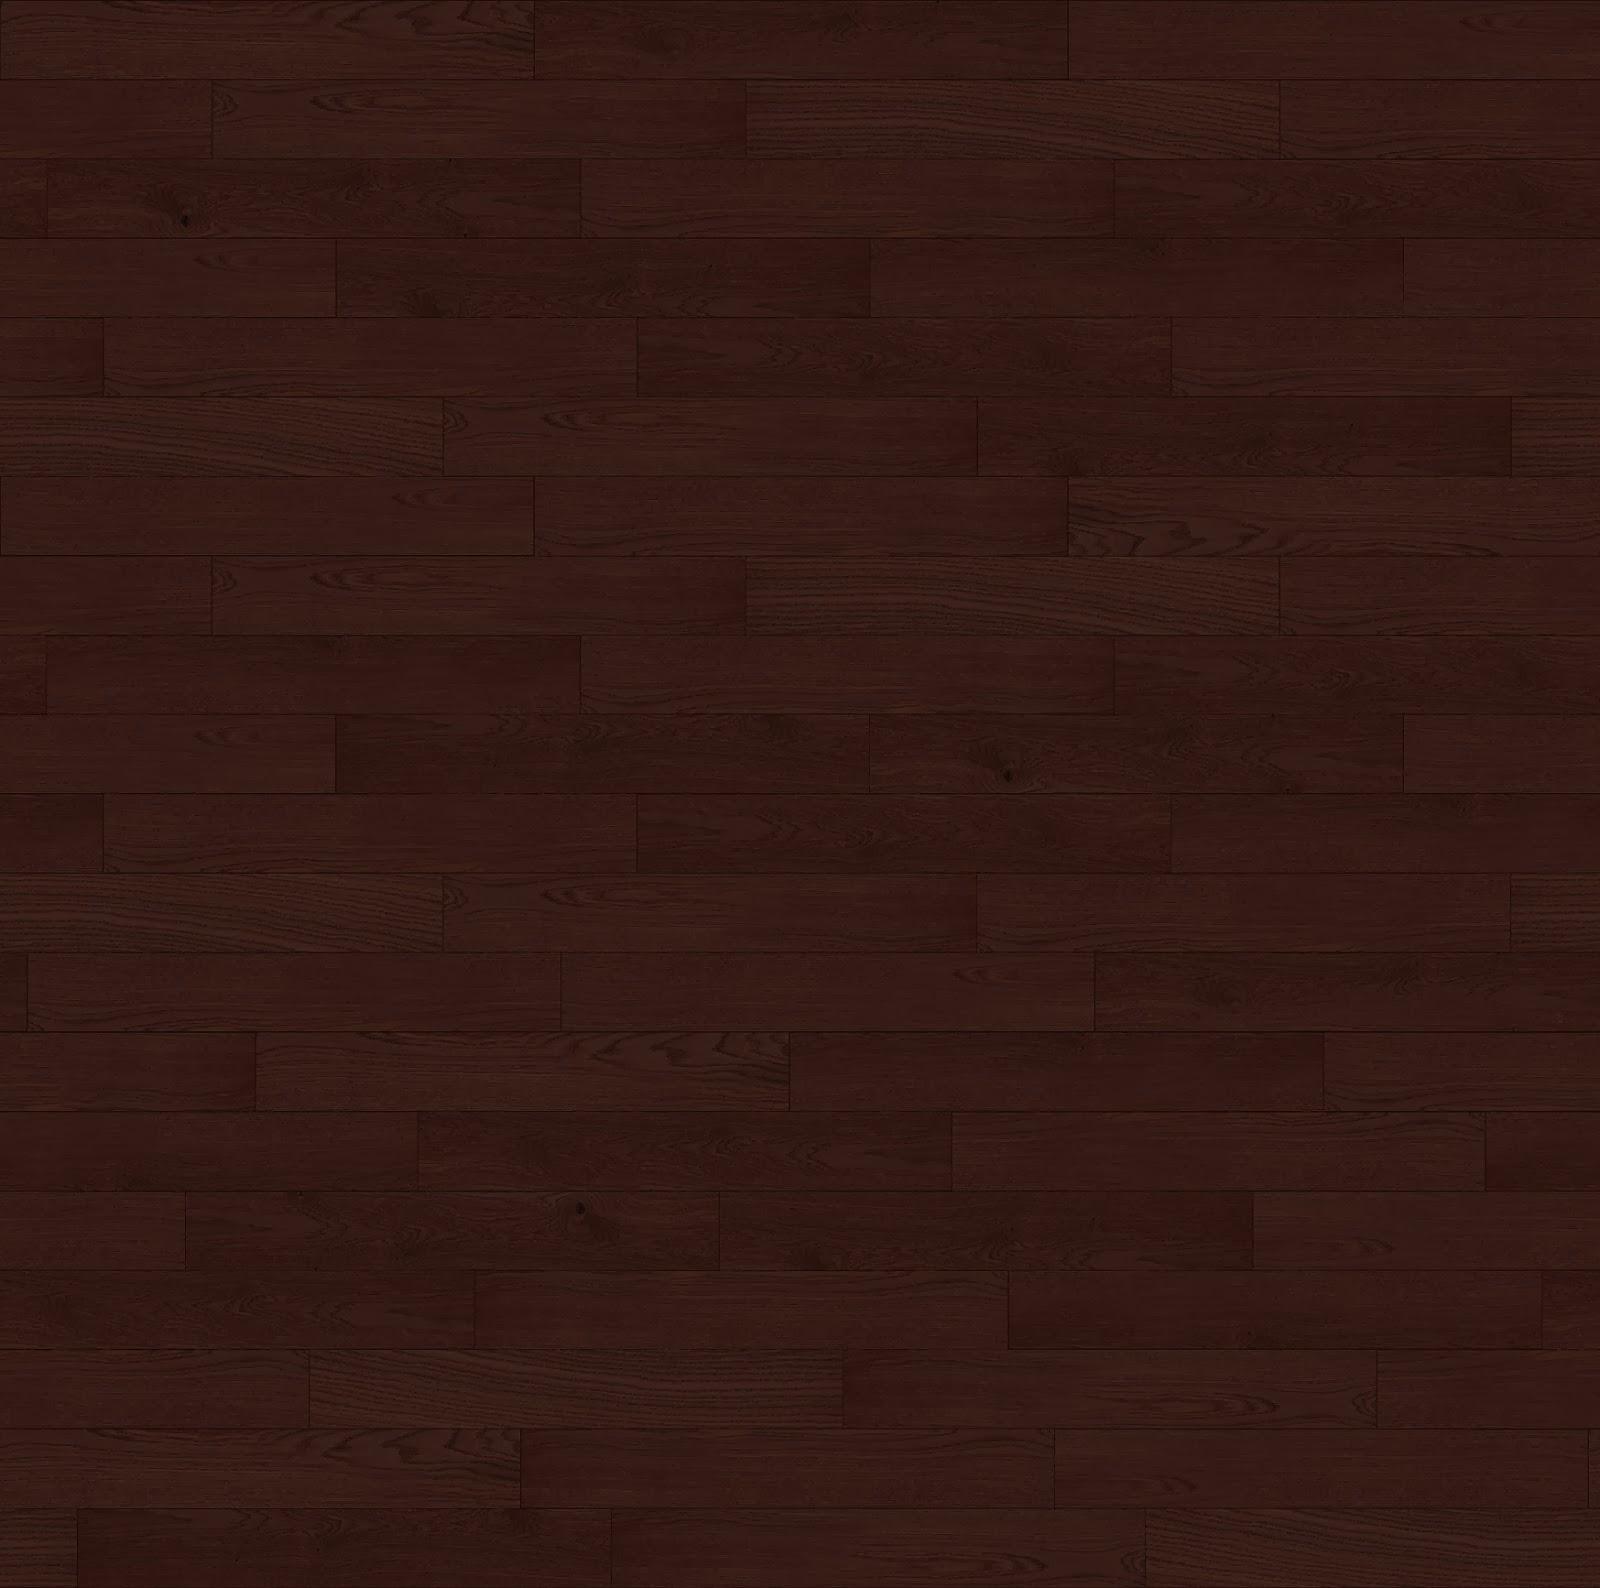 texture free texture parquet